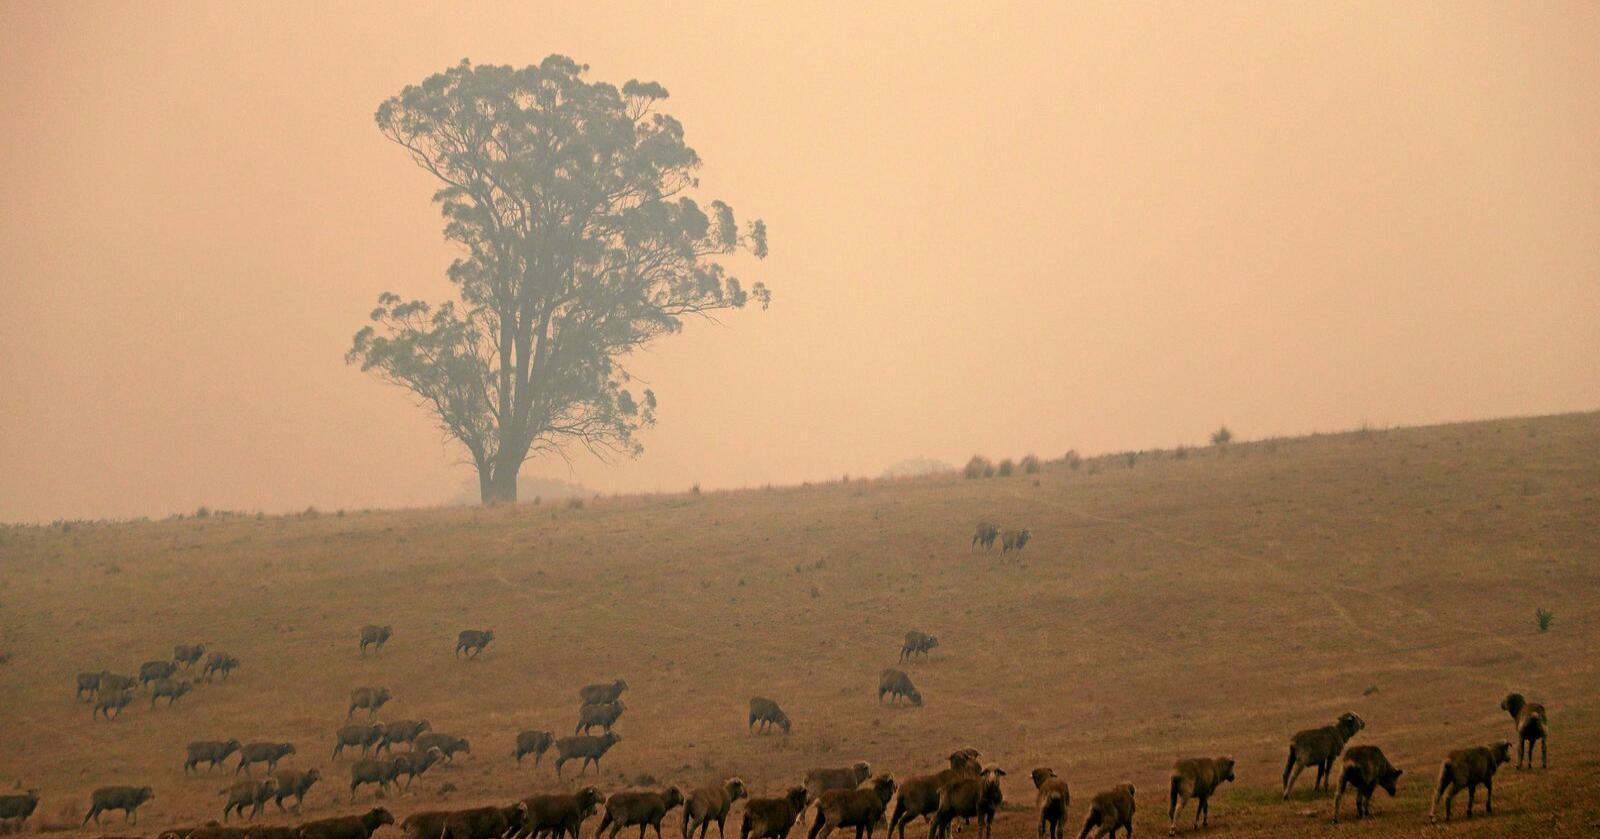 Ein saueflokk i røykskyene i nærleiken av Burragate i Australia laurdag 11. januar. Foto: Rick Rycroft/NTB Scanpix